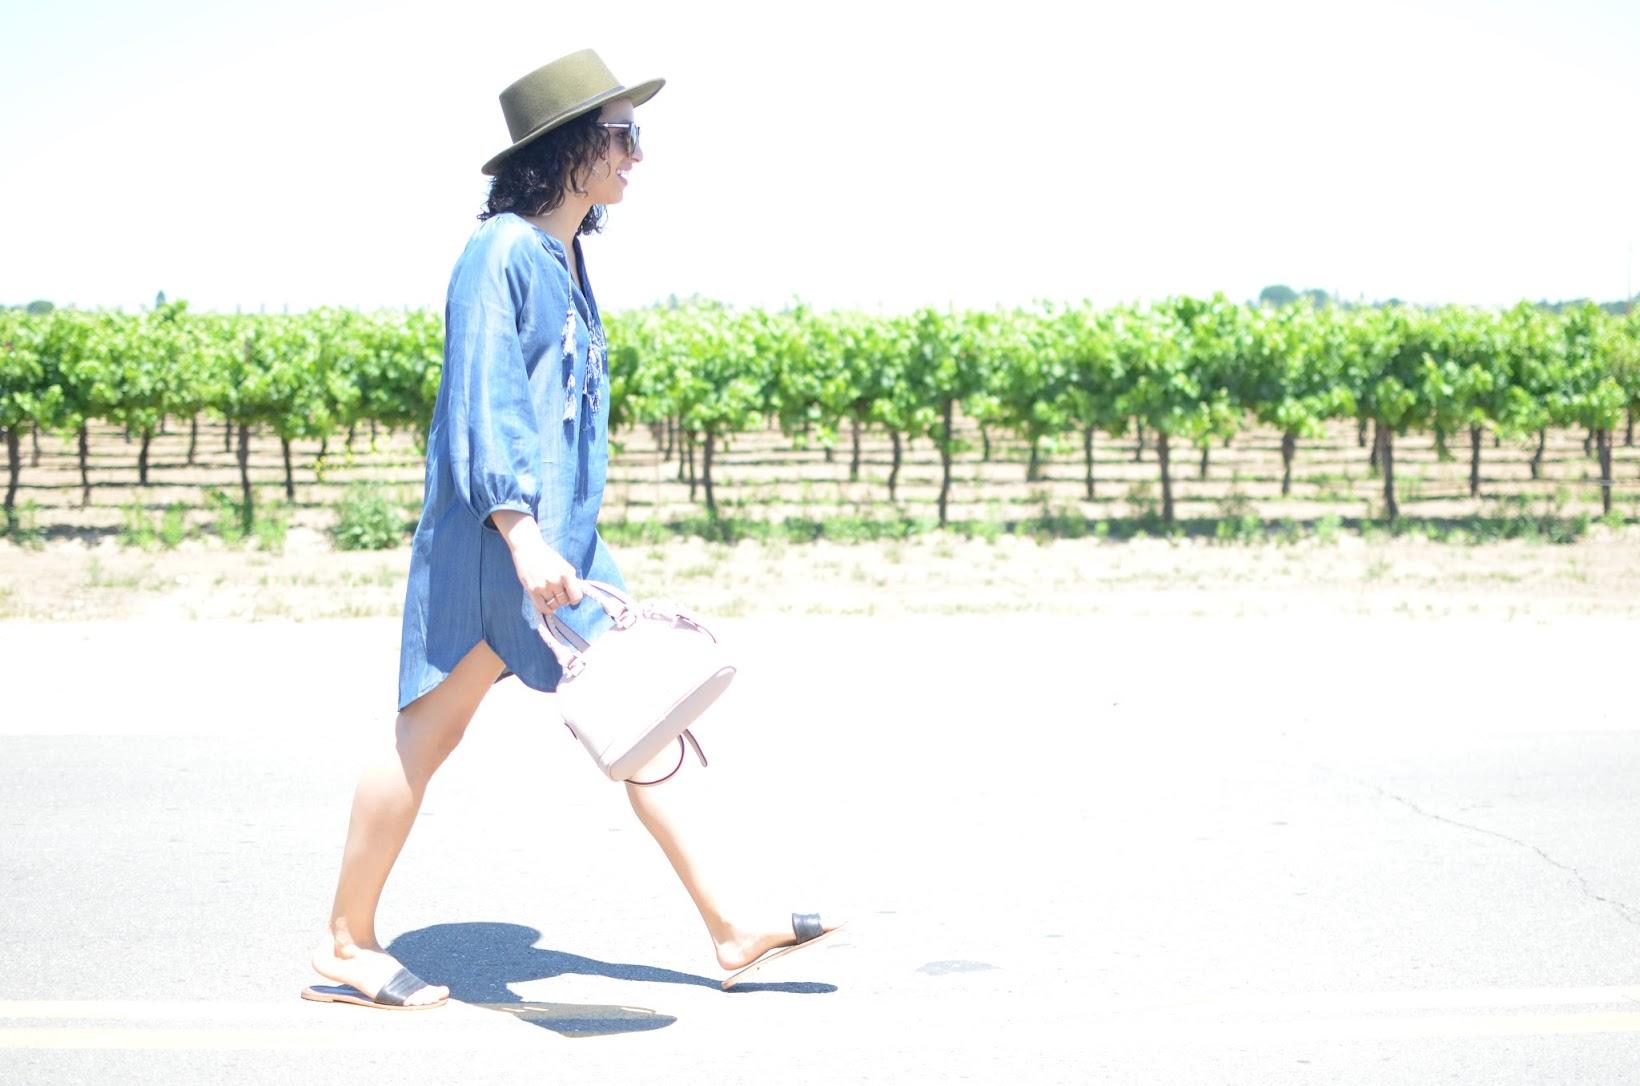 TopShelf Style, tunic, tassel tunic, SF style, Goorin Bros fedora, slide sandals, Urban Expressions, curly hair, Karen Walker Super Sunglasses, Lodi wine